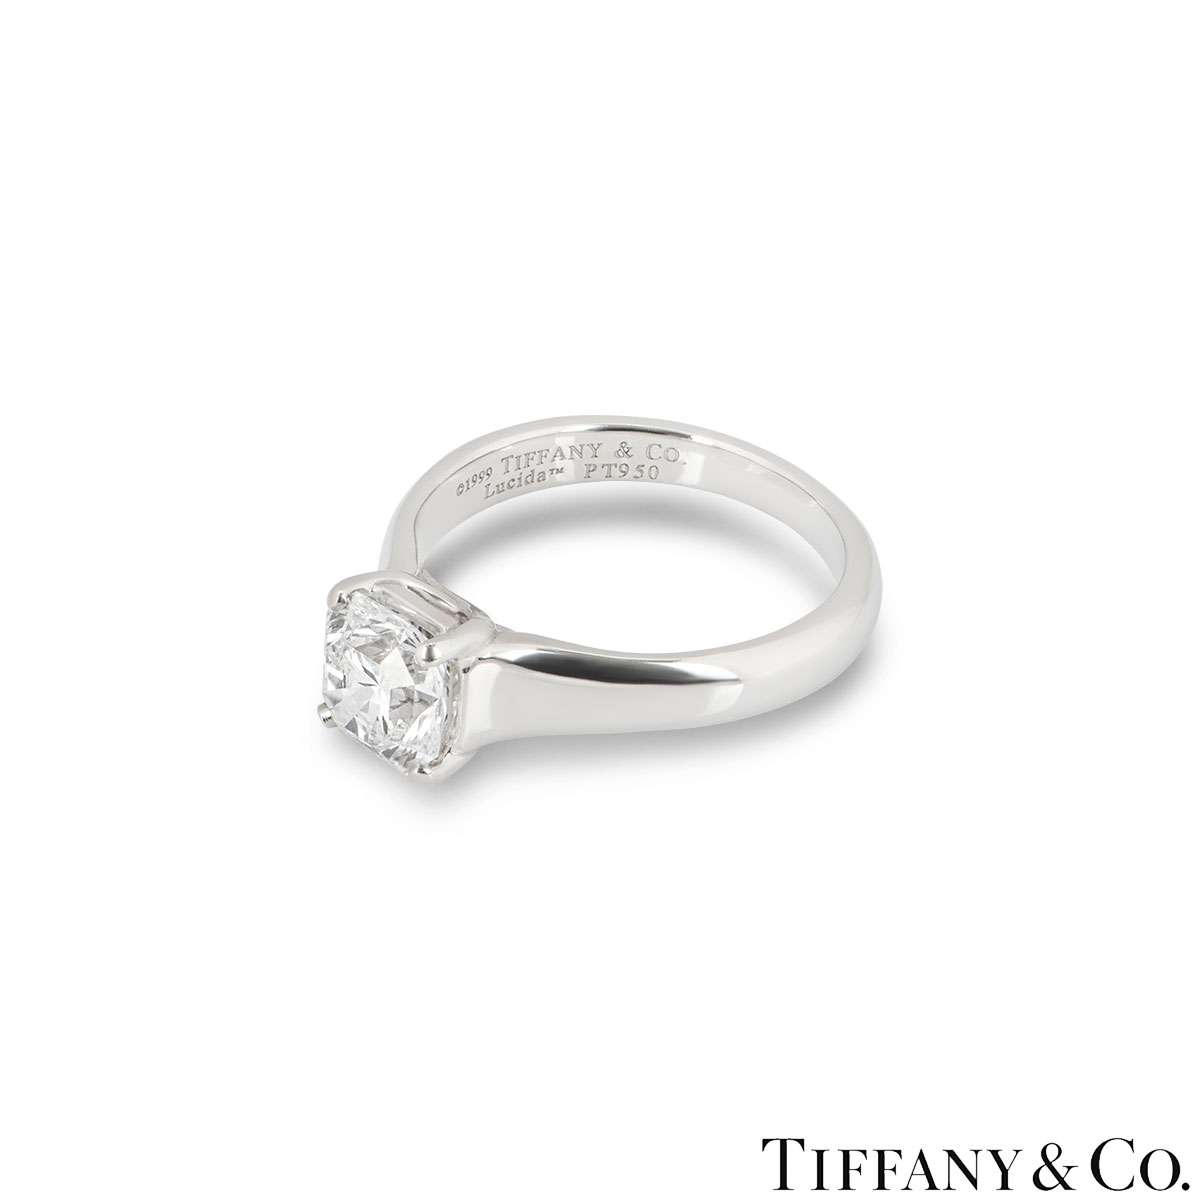 Tiffany & Co. Lucida Cut Diamond Ring 1.27ct E/VS1